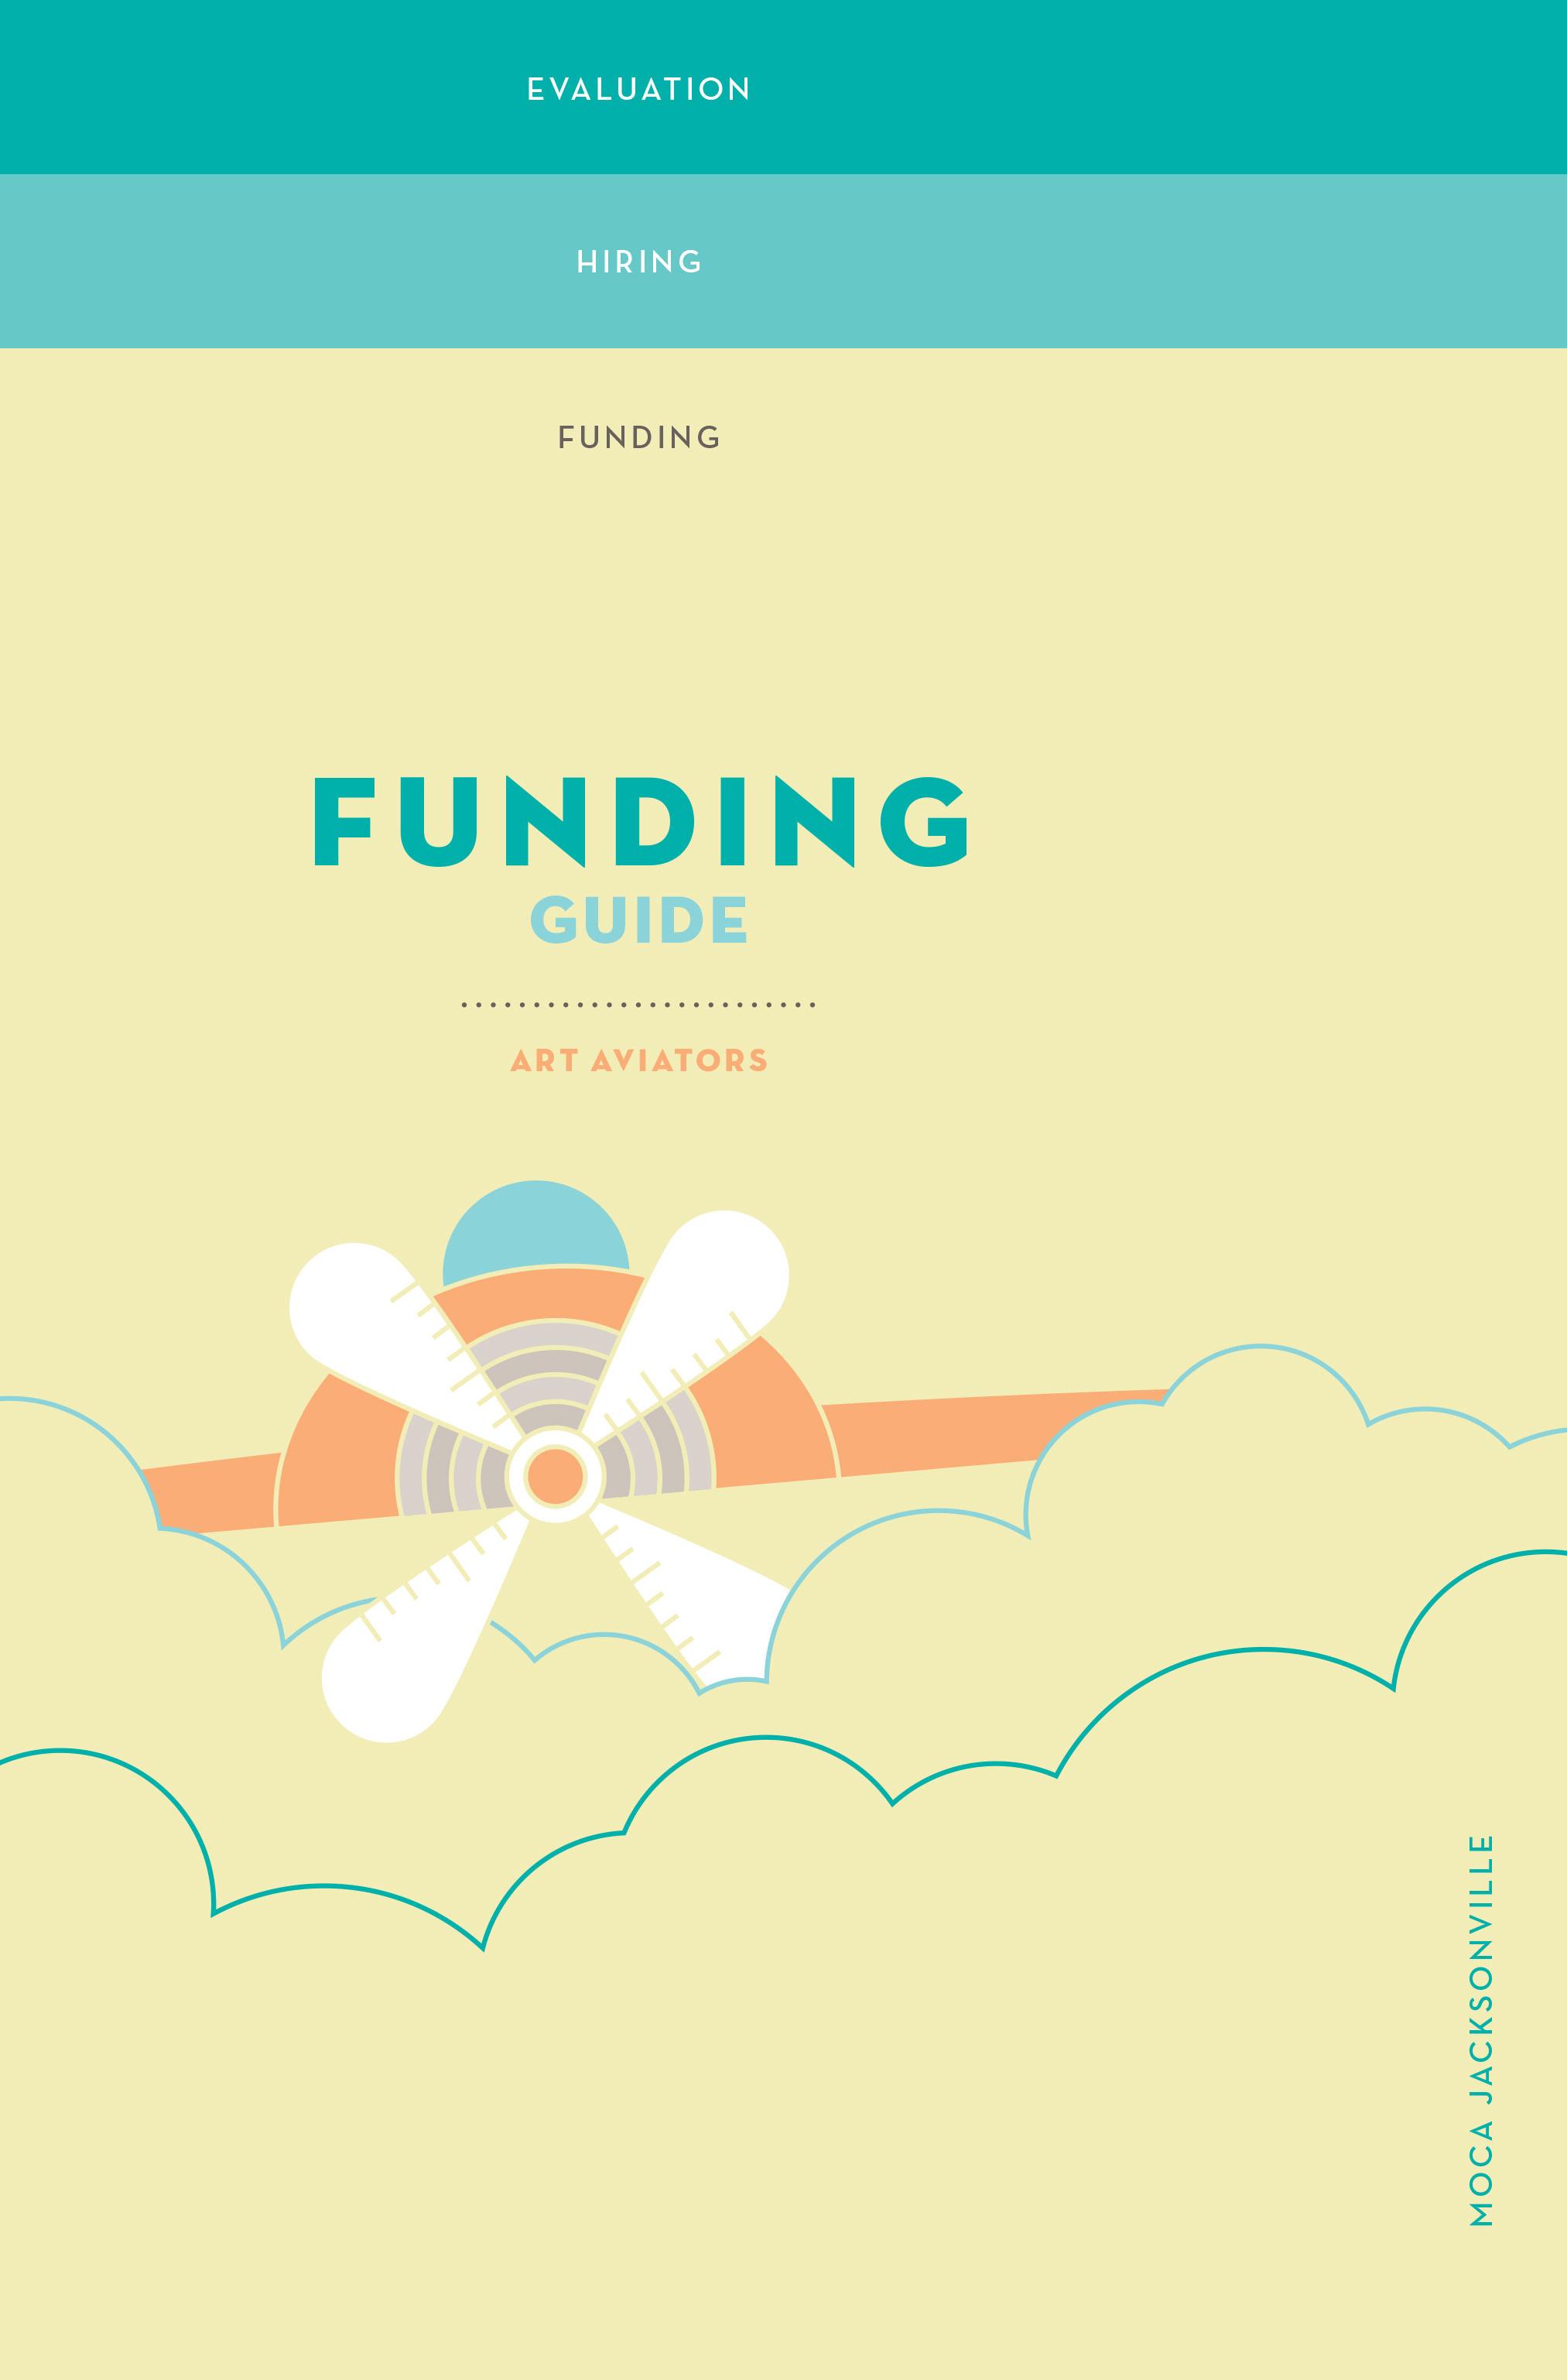 0514_EDU_RA_QuickStartGuide03_D6_HR-2_Funding.jpg